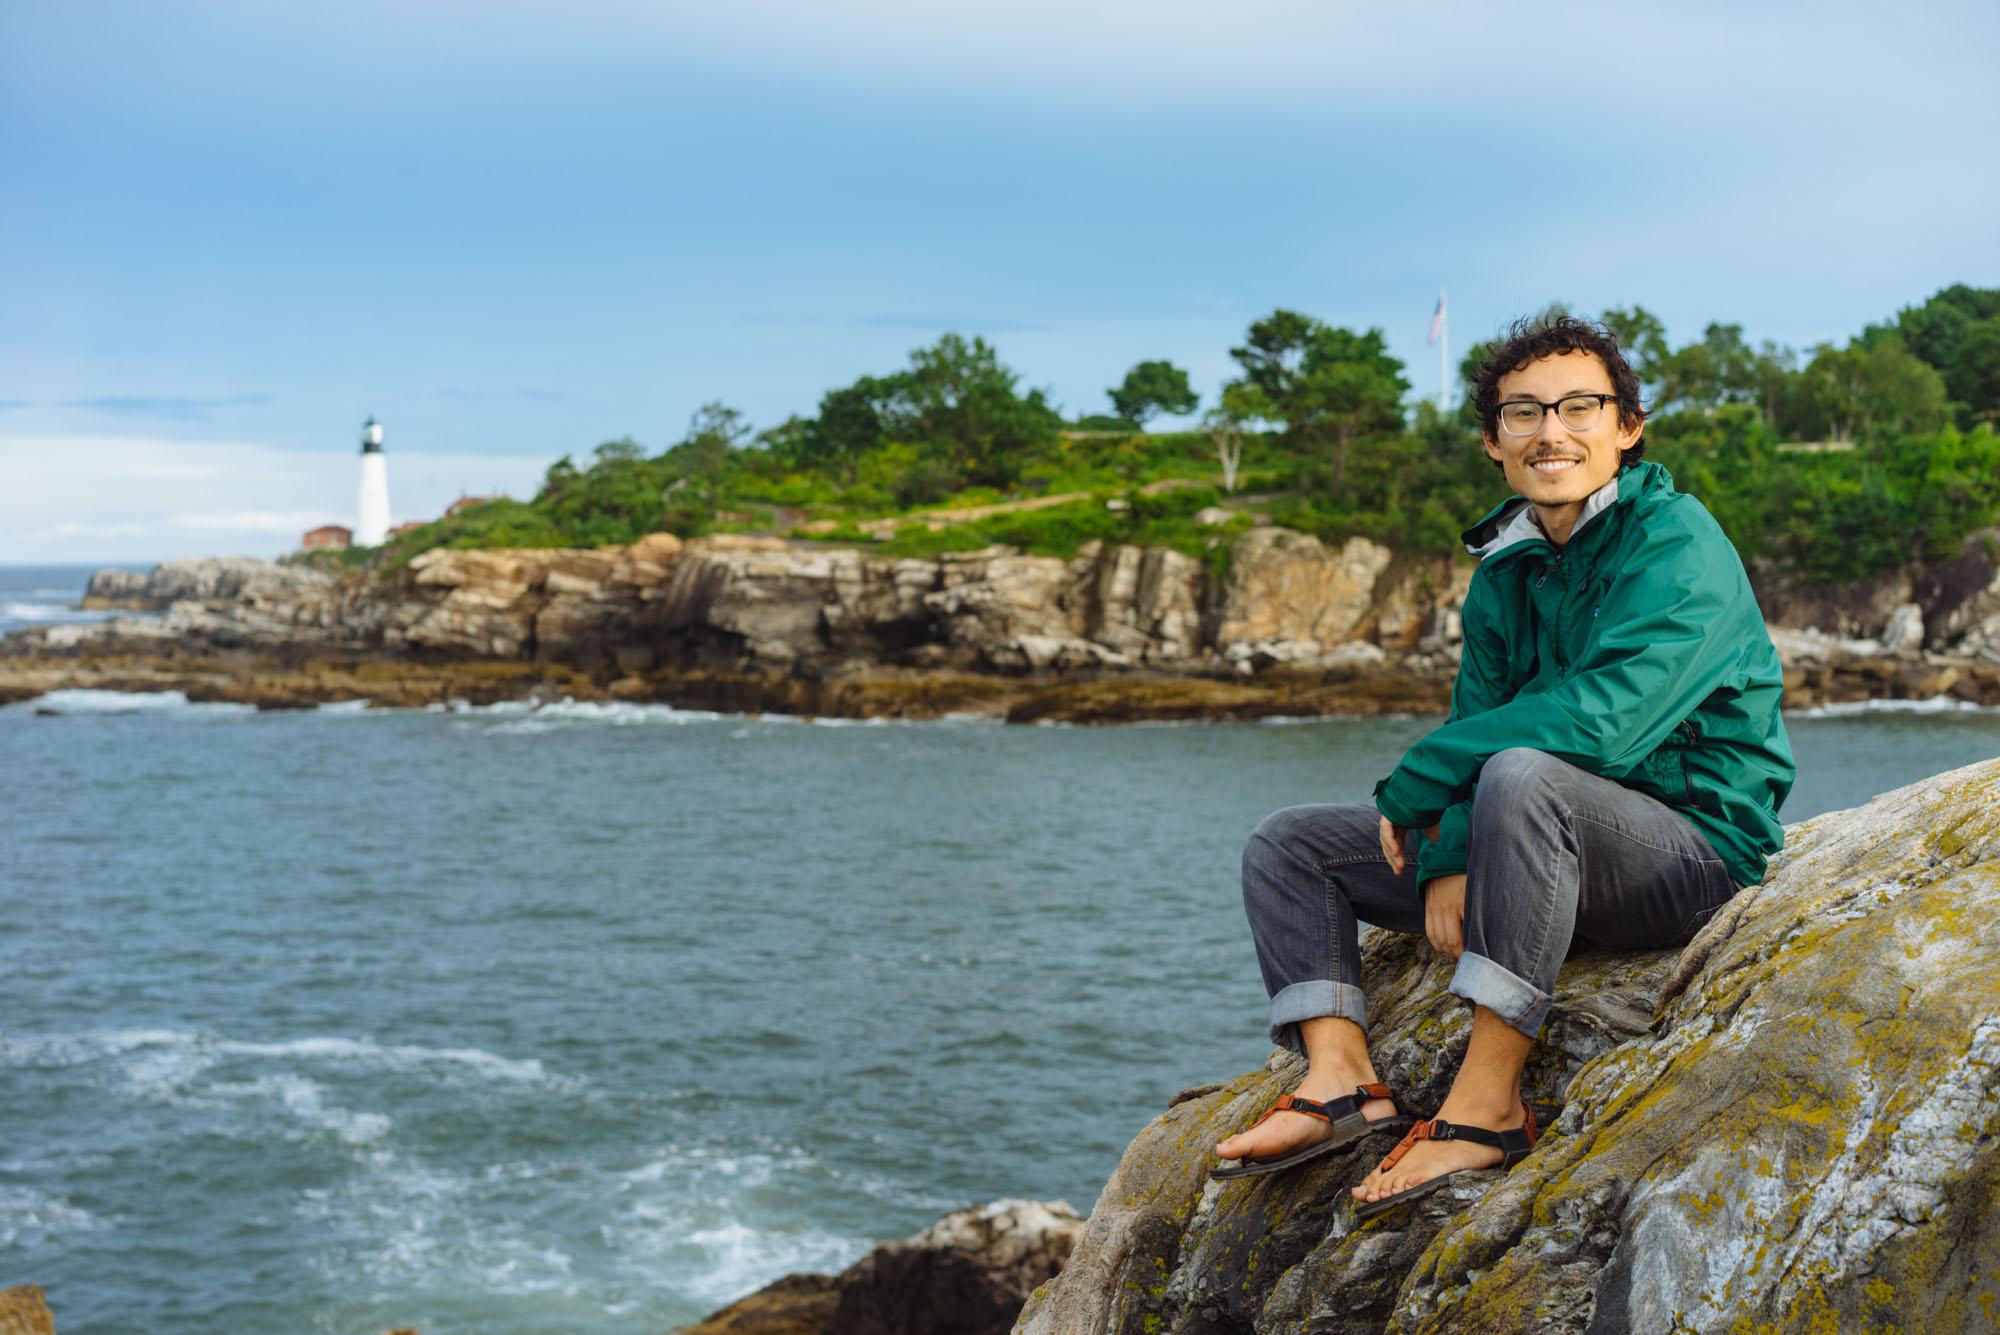 Owen in front of Portland Head Lighthouse